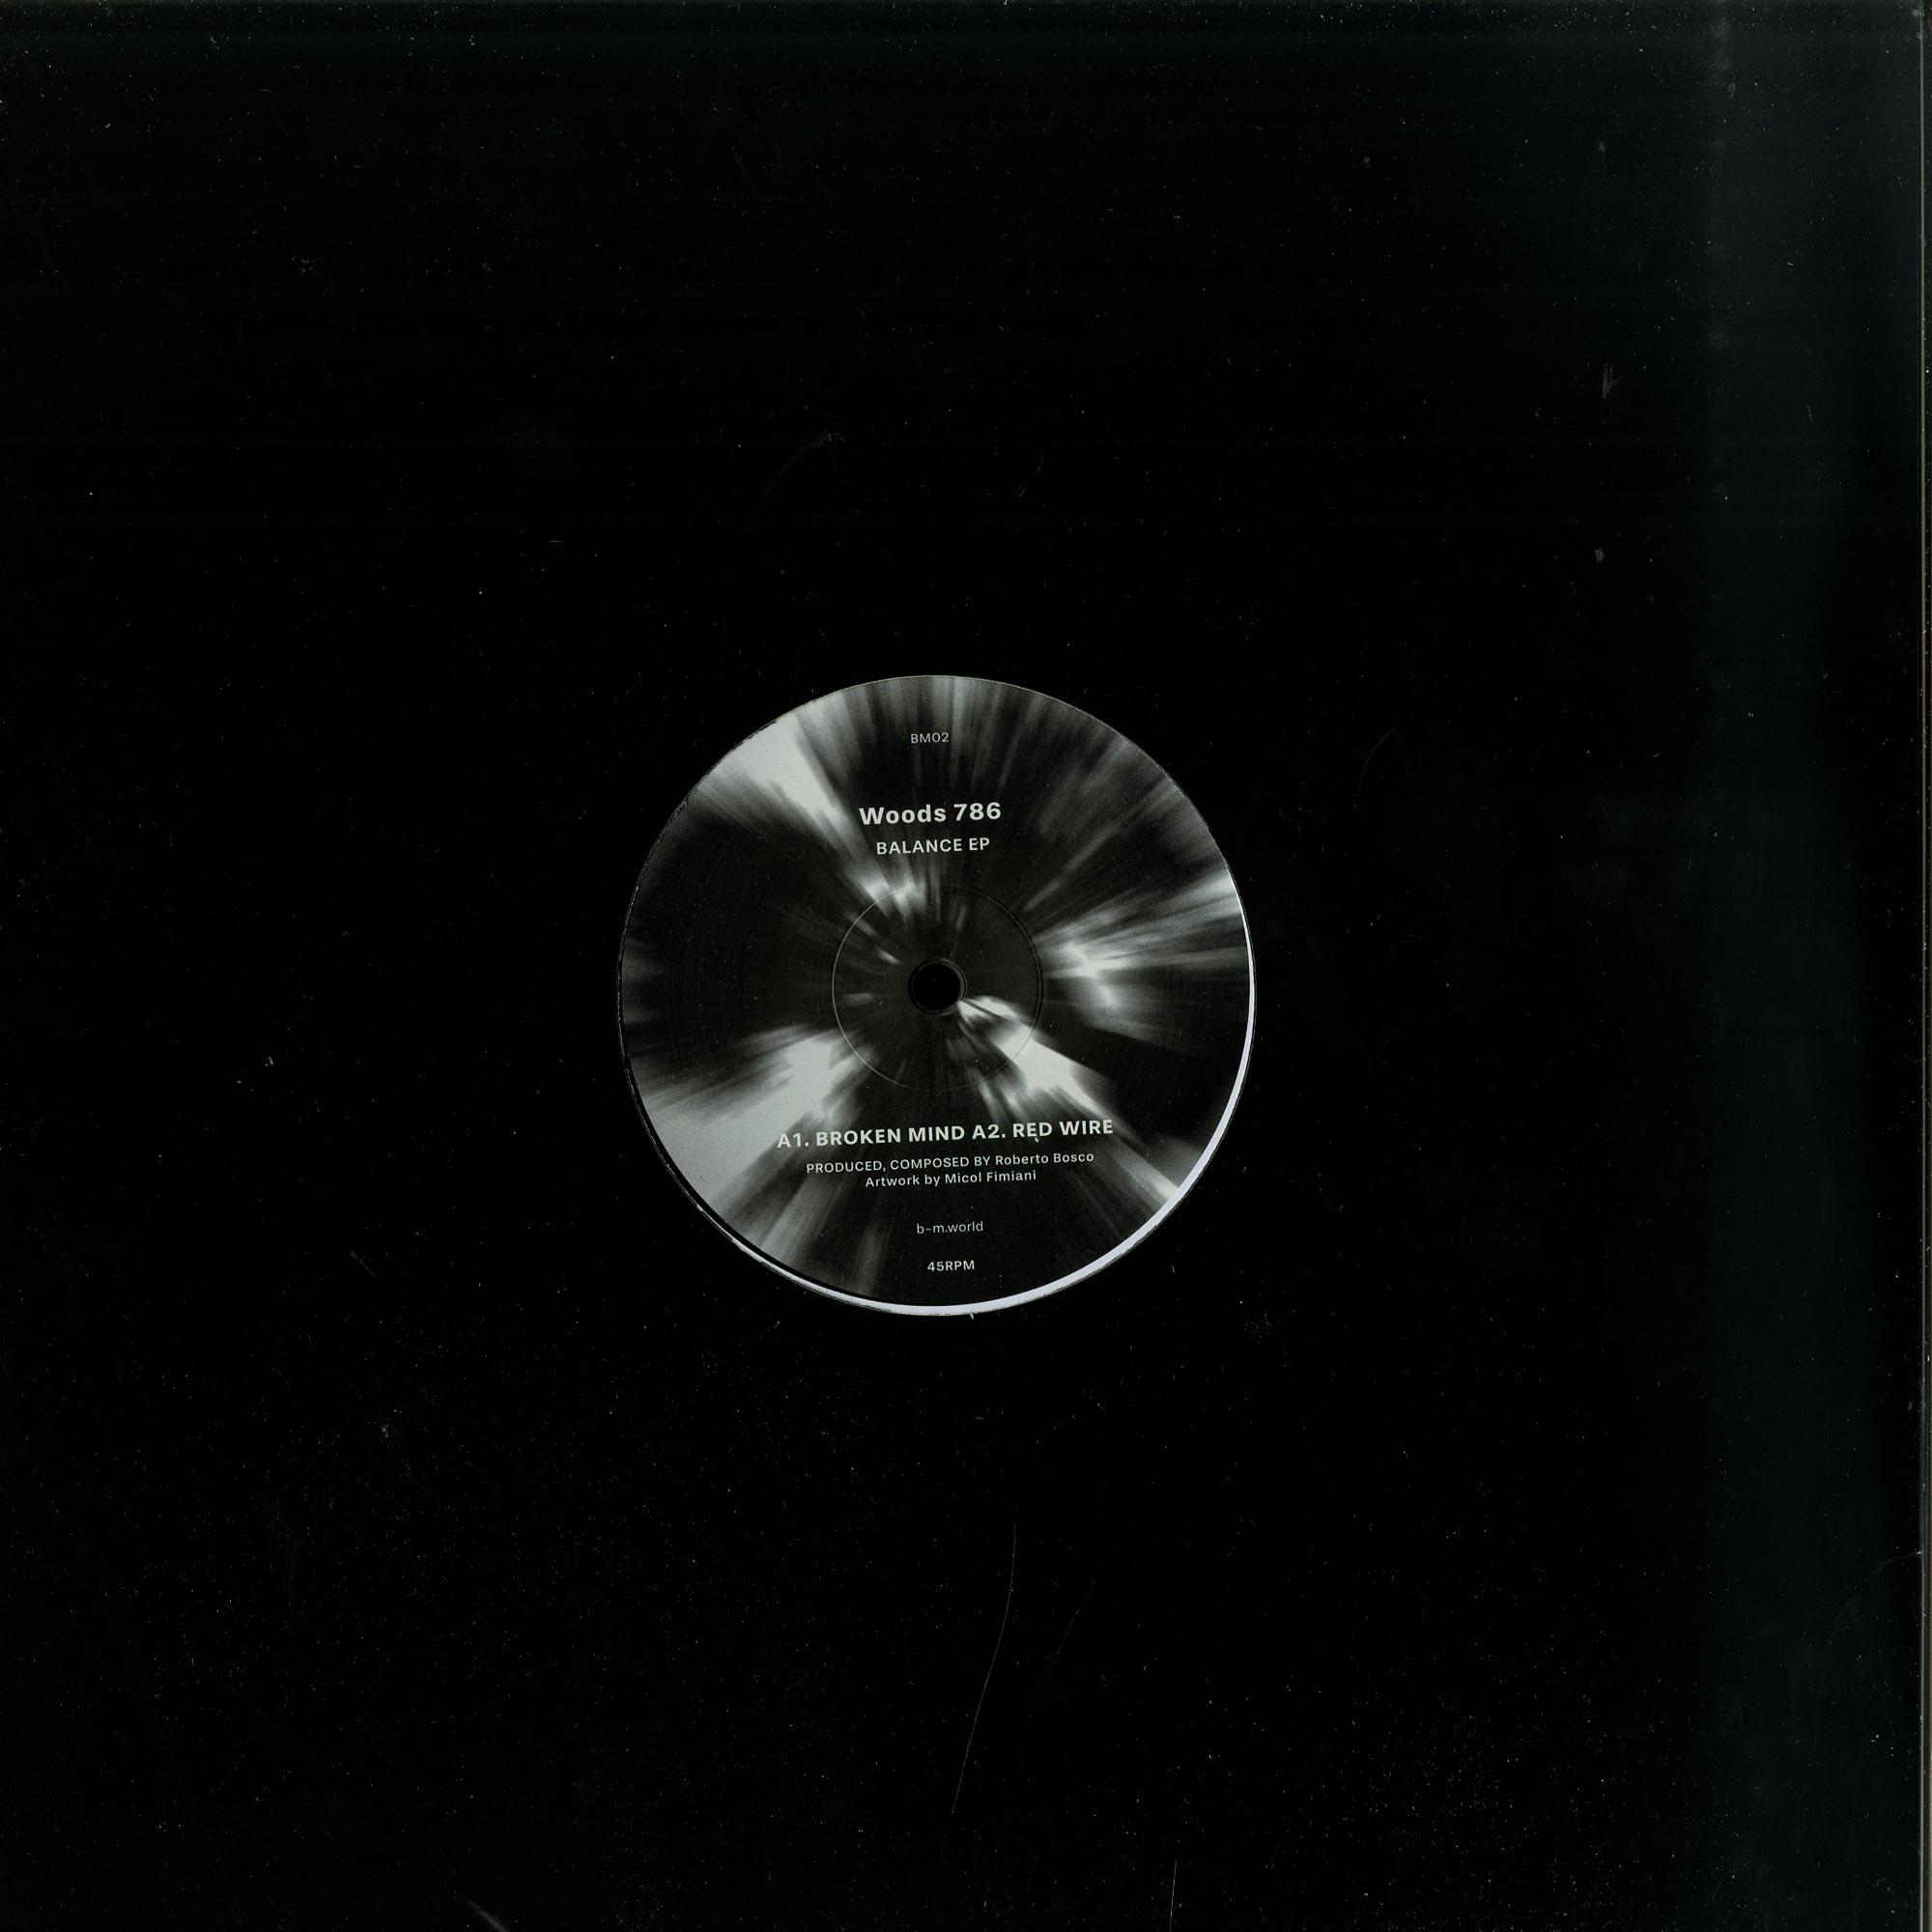 Woods 786 - BALANCE EP